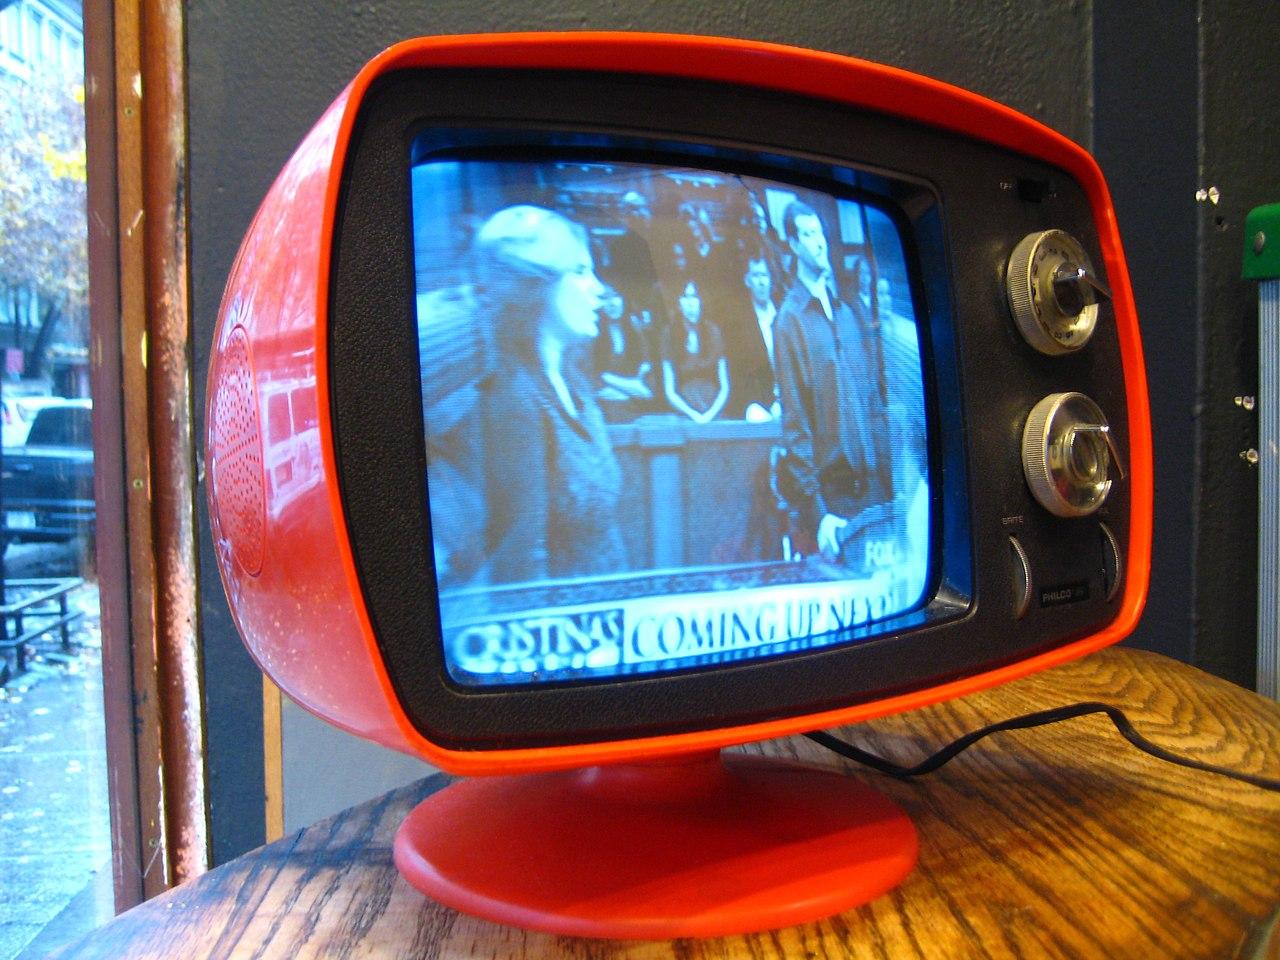 File:Philco-Ford Orange Retro TV (1970s).jpg